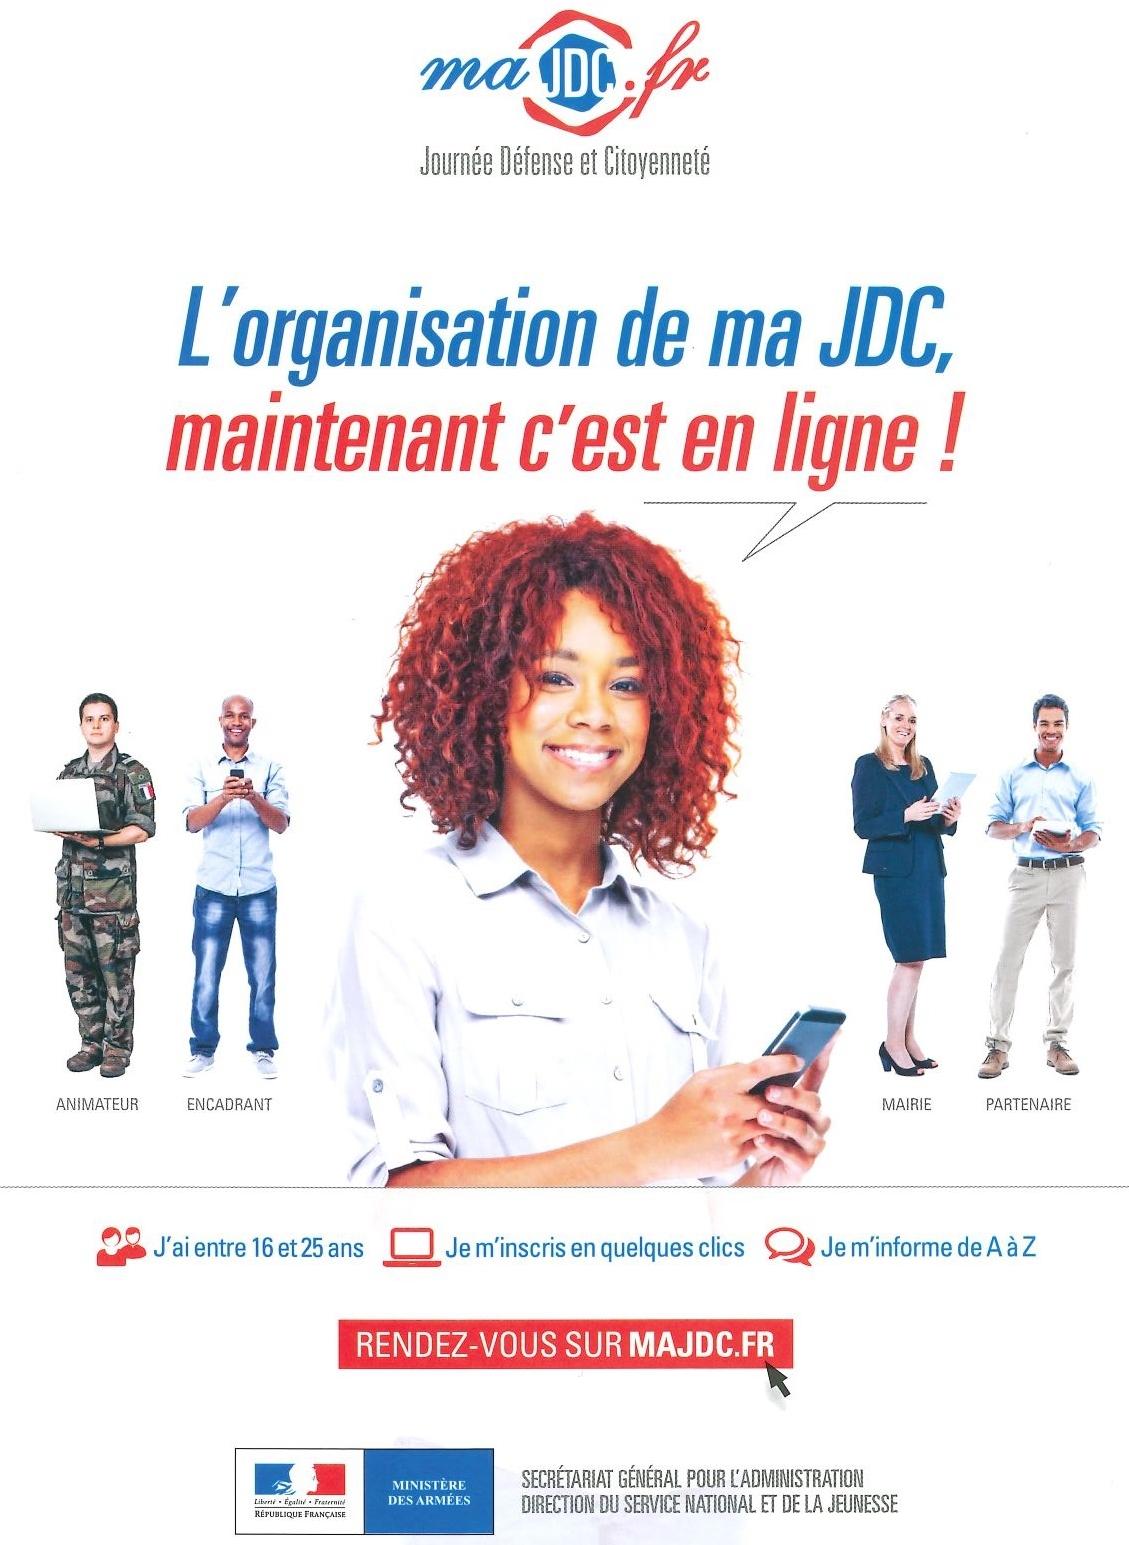 jdc_page_1.jpg